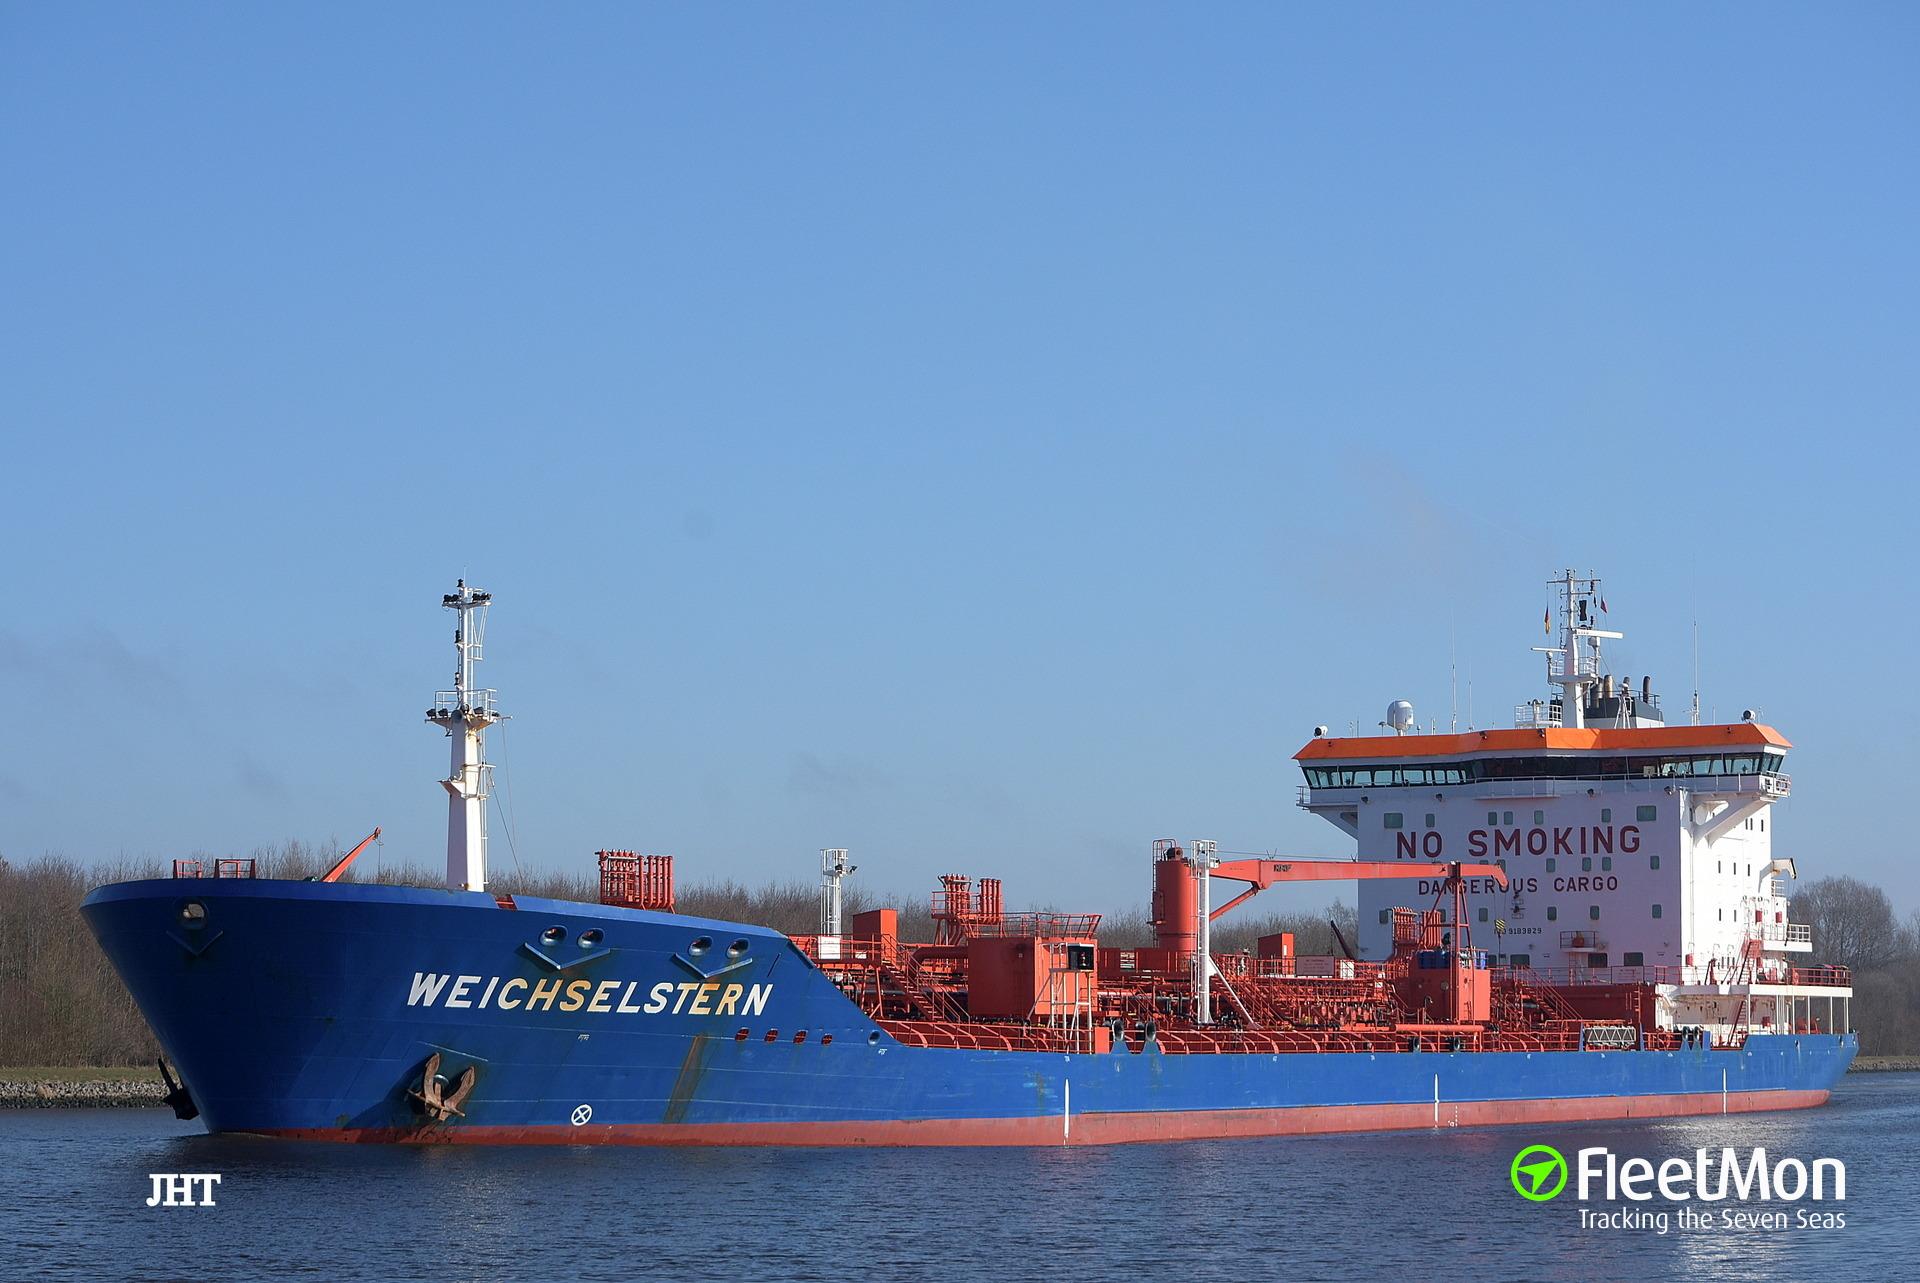 вакансии матроса на танкера течение